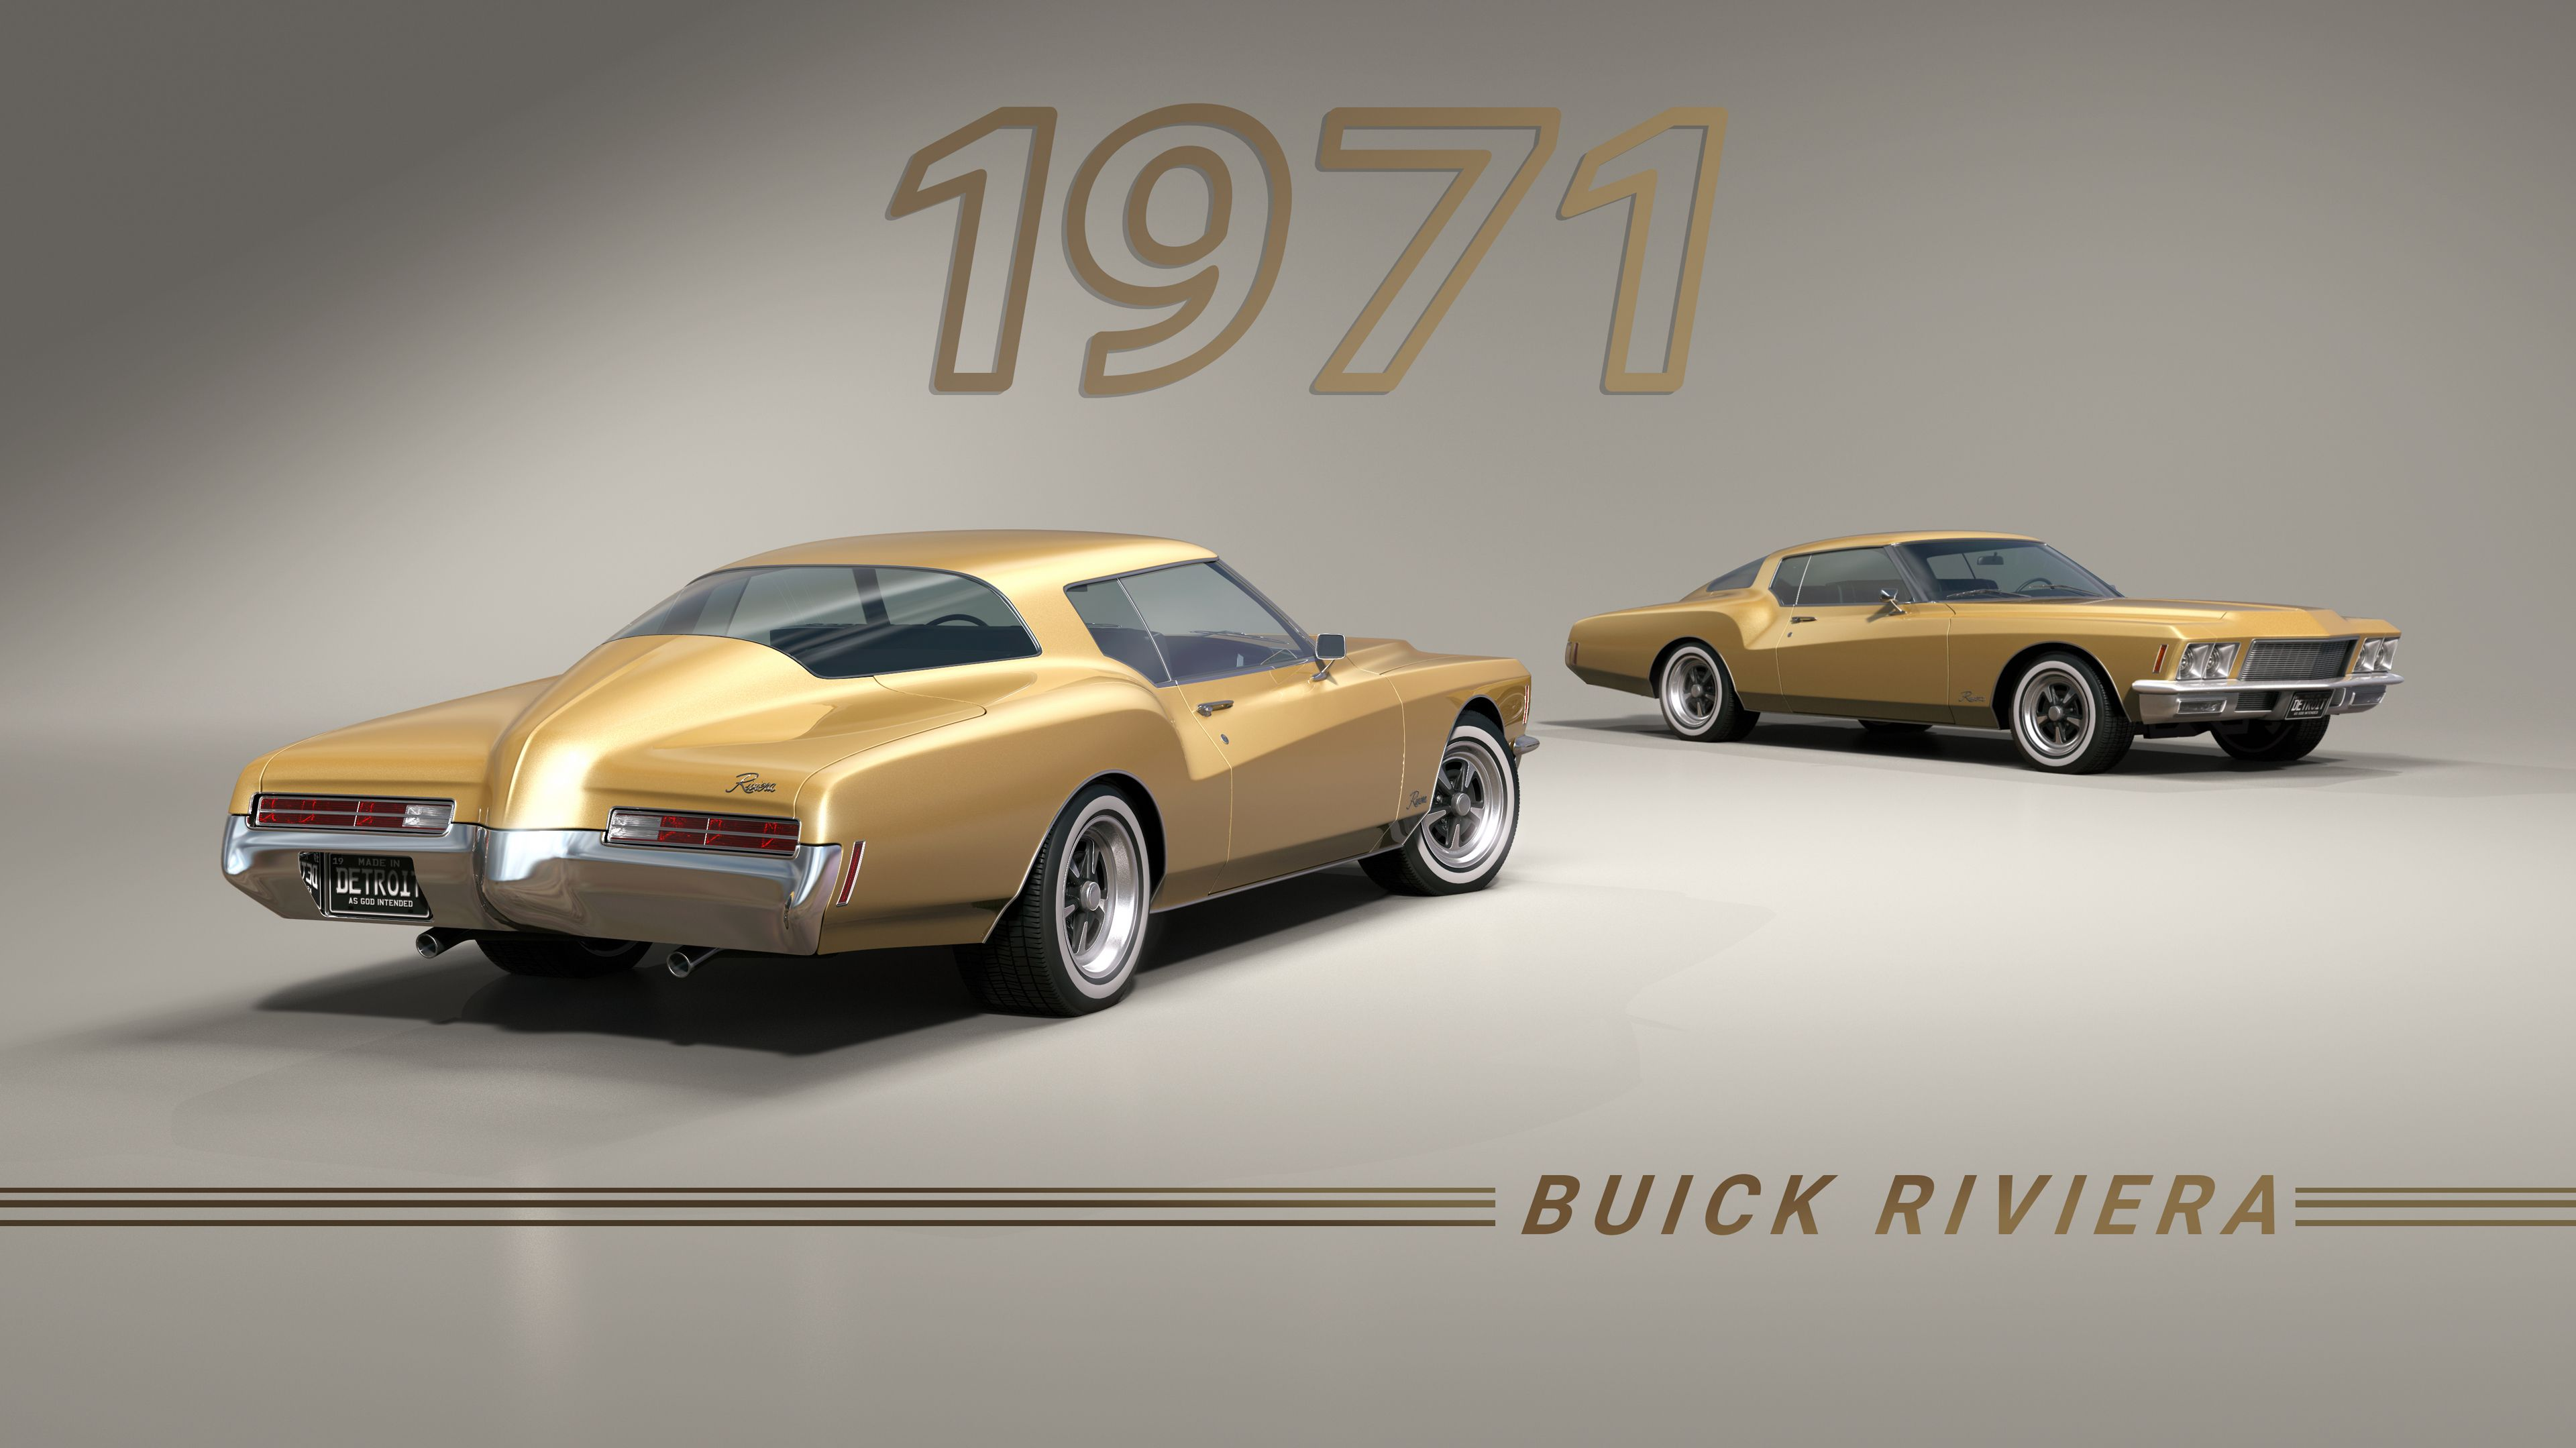 3840x2160 1971 buick riviera rendered in keyshot by. Black Bedroom Furniture Sets. Home Design Ideas